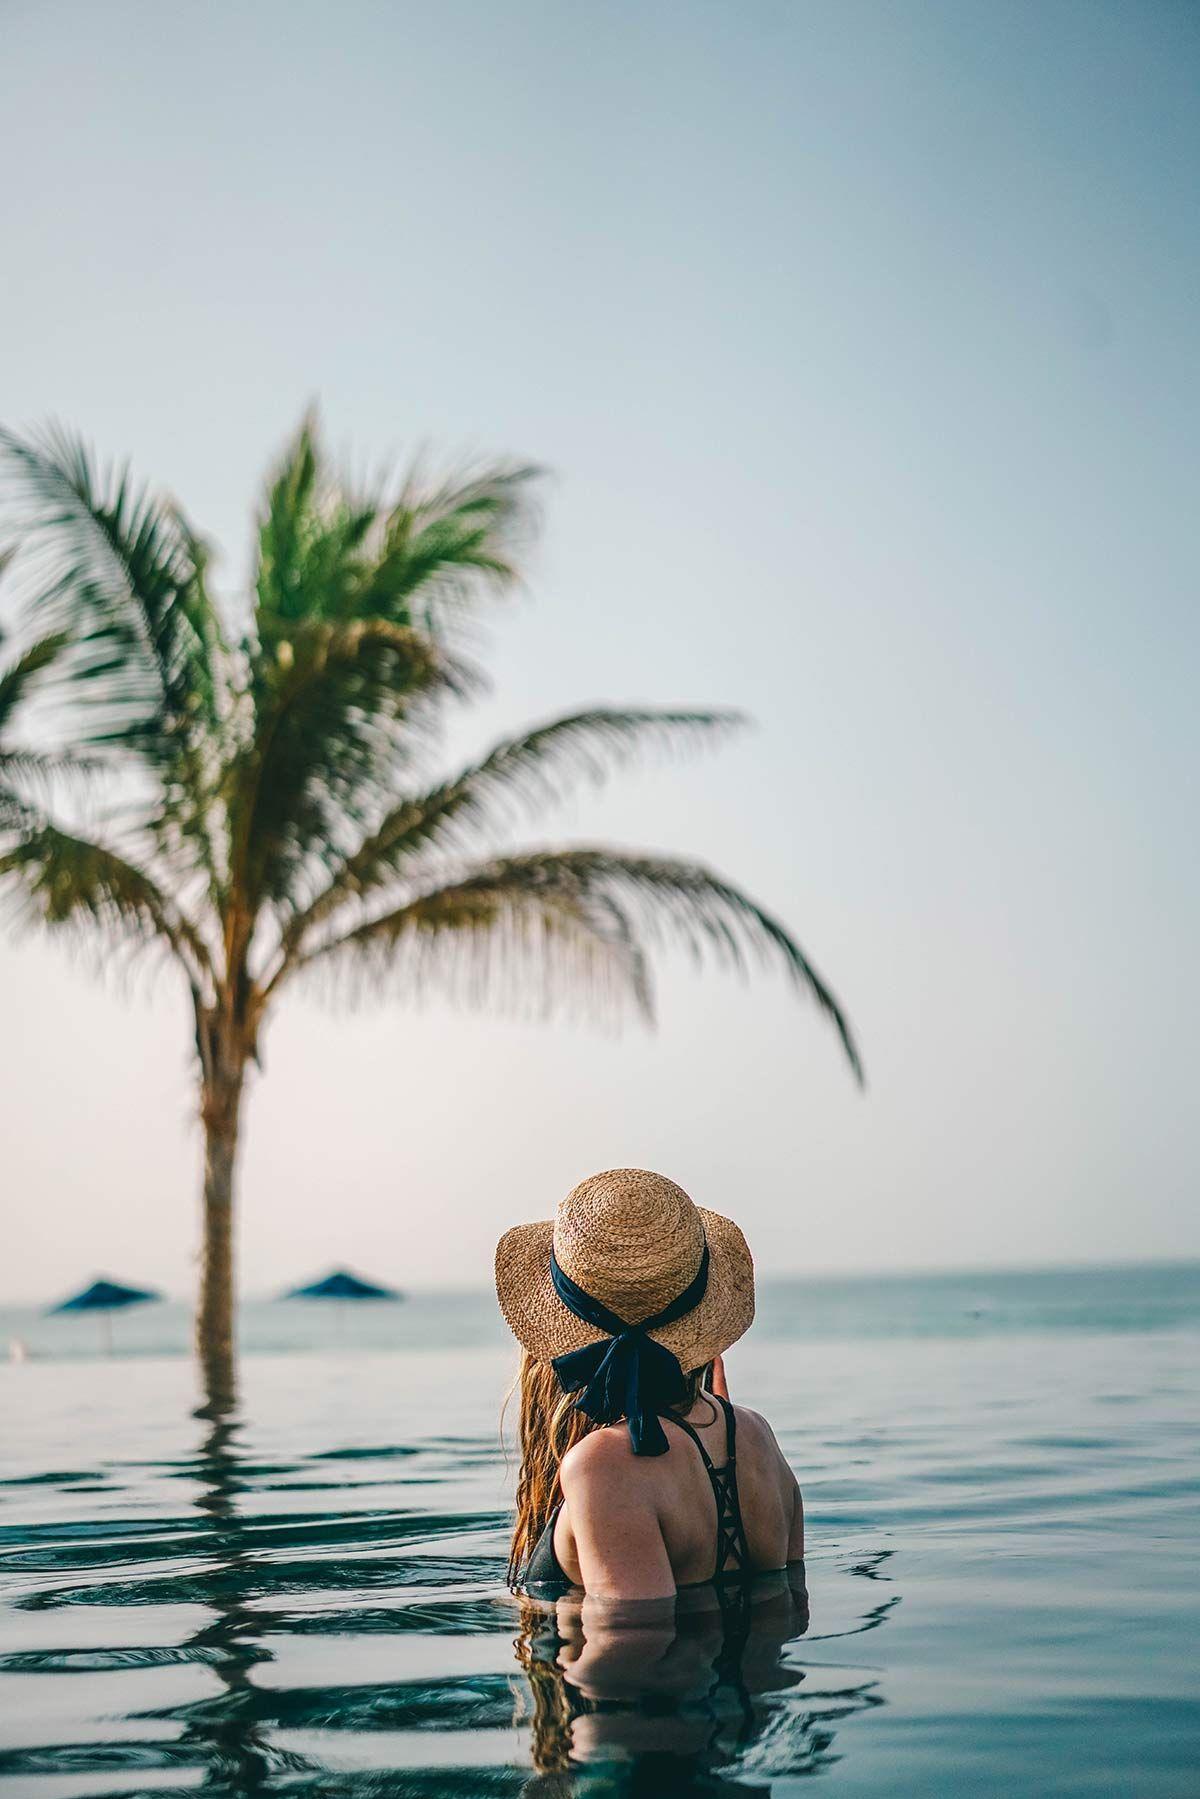 Oman Urlaub 7 Grunde Nach Salalah Im Oman Zu Reisen Oman Urlaub Salalah Urlaub